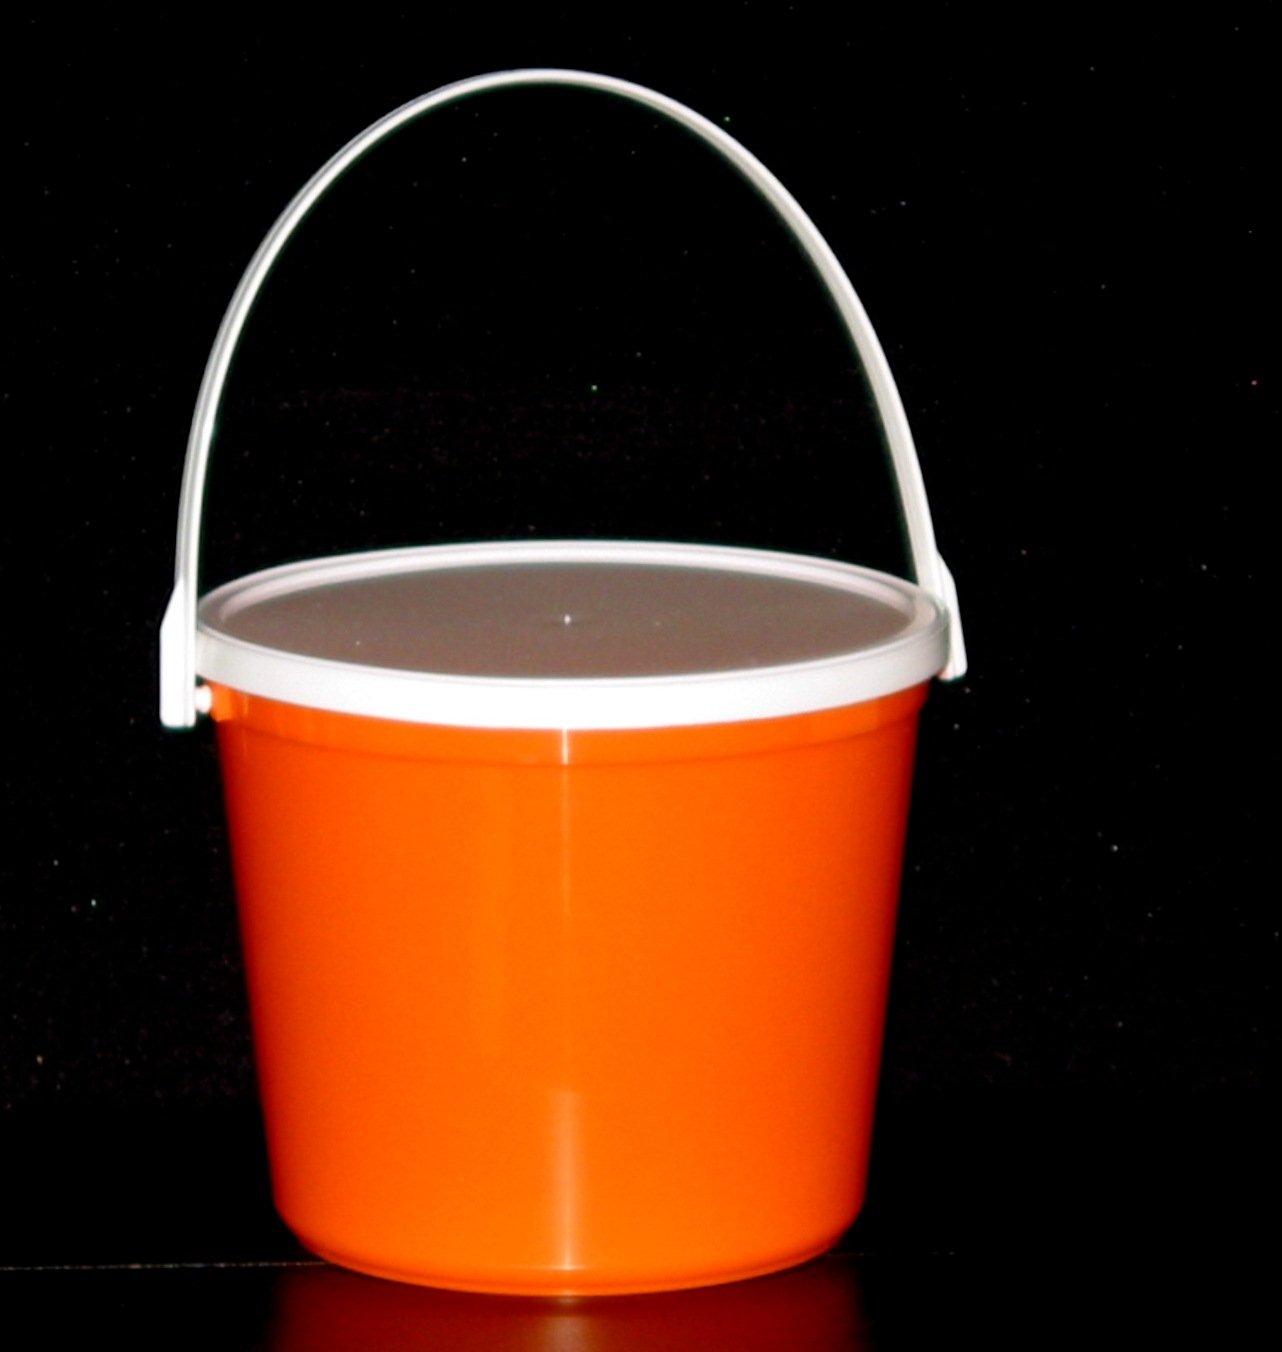 Plastic Buckets & Lids, 80 Ounces, 6 Pack,1 each Red Blue Yellow Orange Purple & Green by Talisman (Image #2)